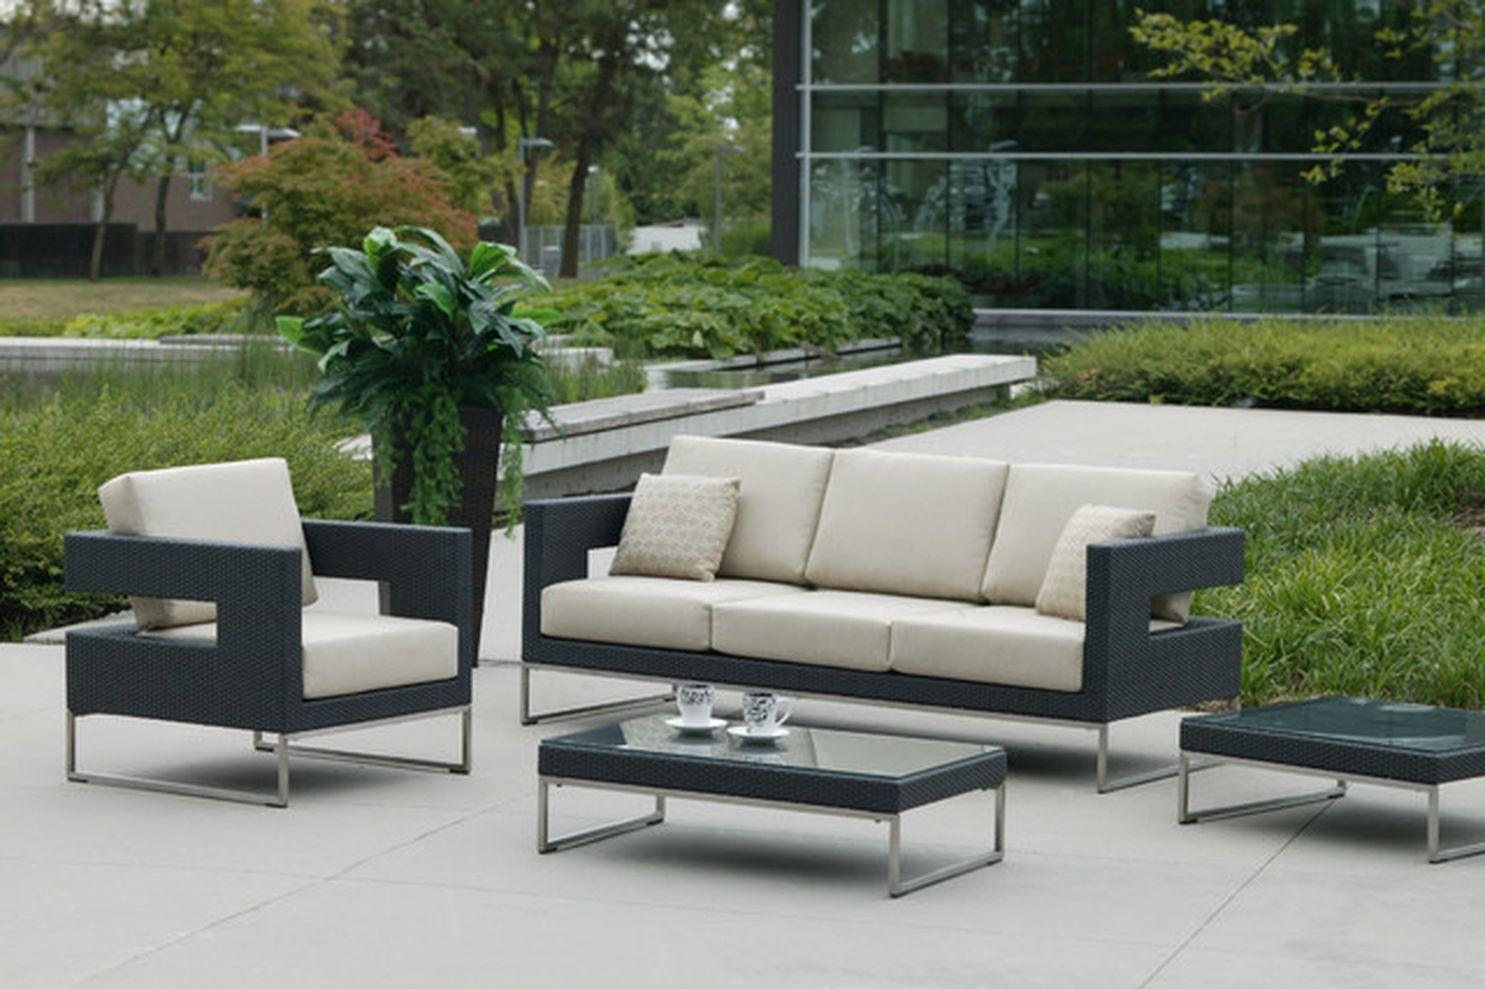 85 stylish small patio furniture ideas httpqassamcount